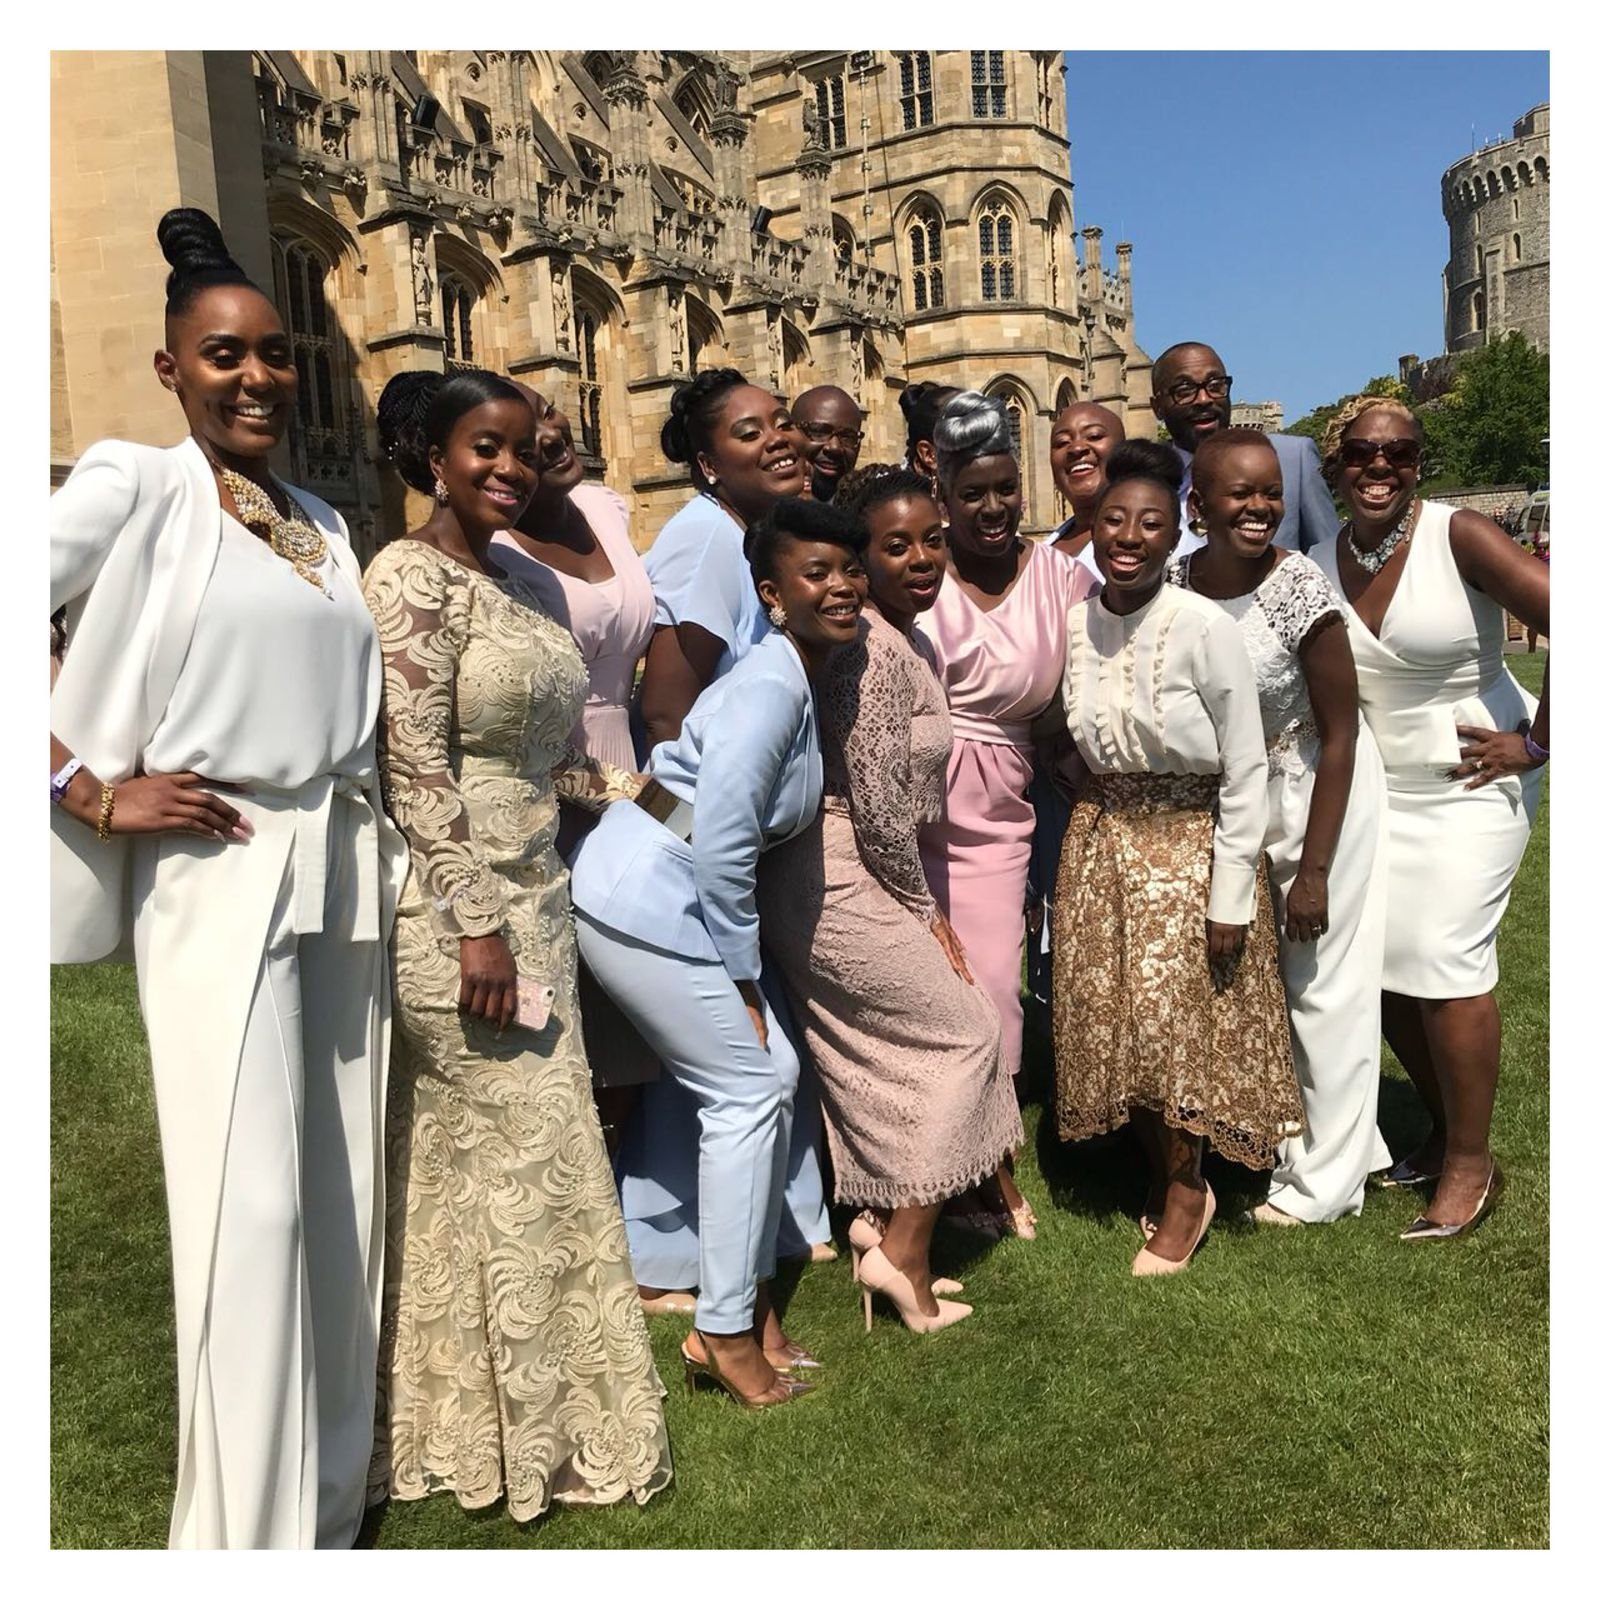 Gospel Choir At Royal Wedding.How The Kingdom Gospel Choir Made Royal Wedding History